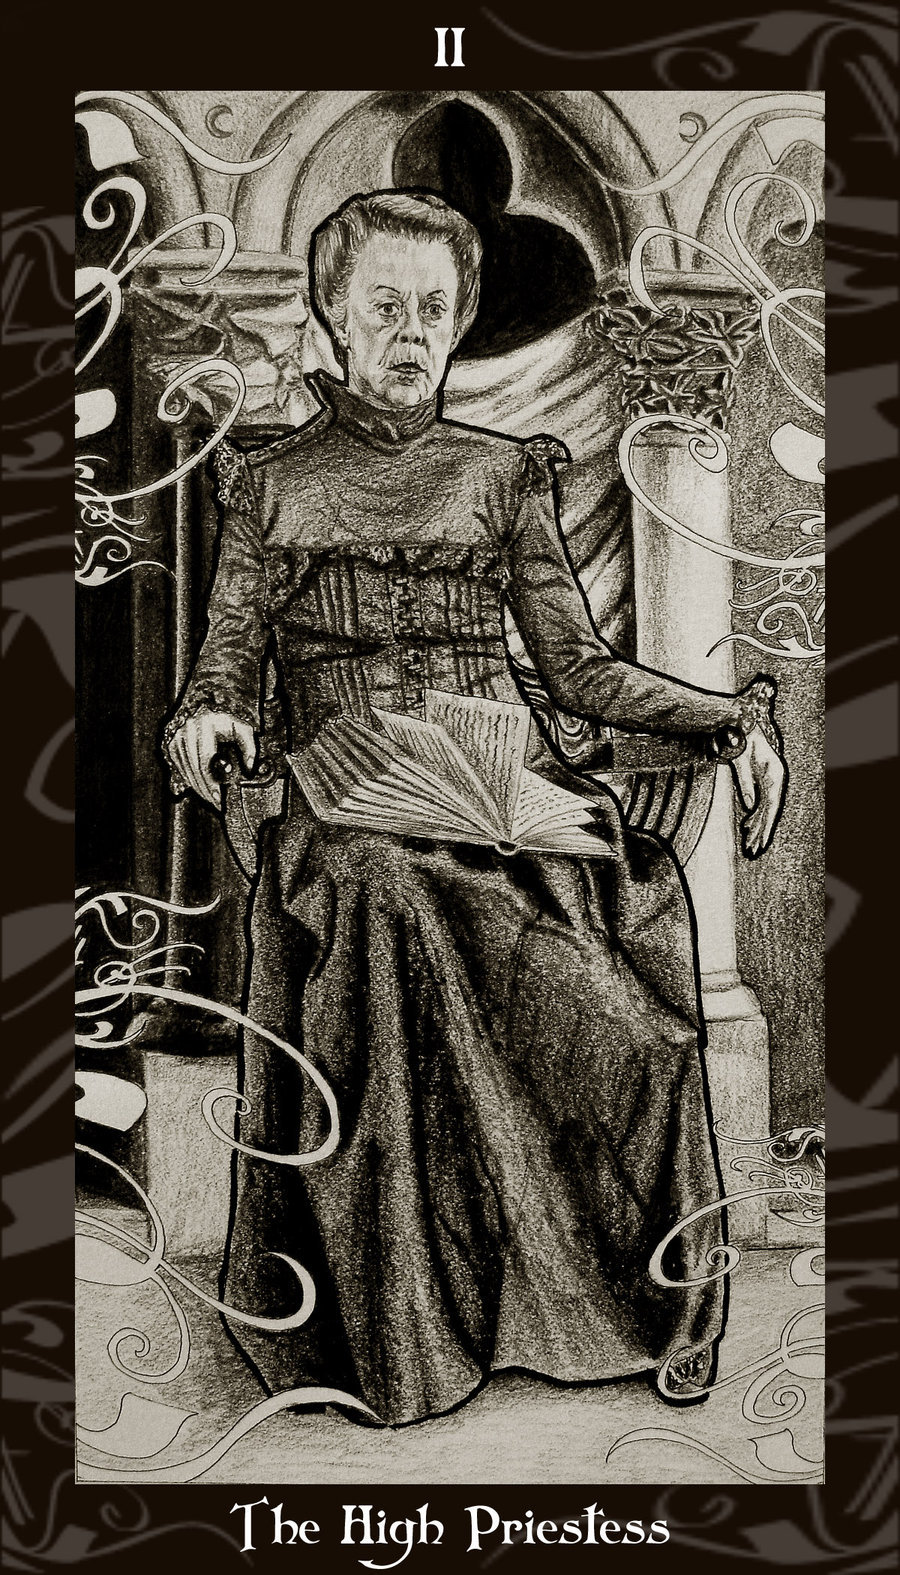 Lá II. The High Priestess – Harry Potter Tarot